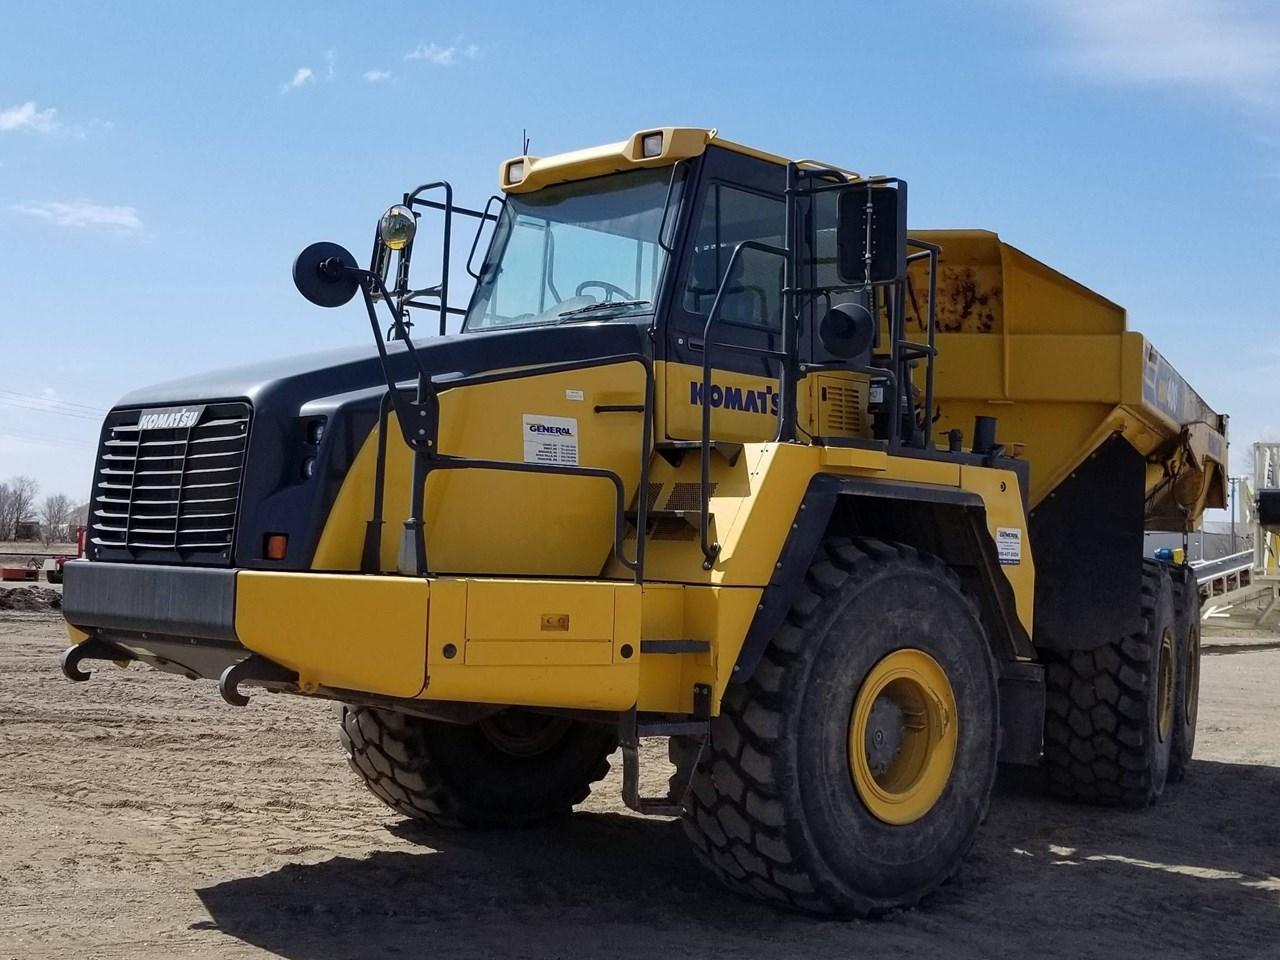 2012 Komatsu HM400-3 End Dump Truck For Sale